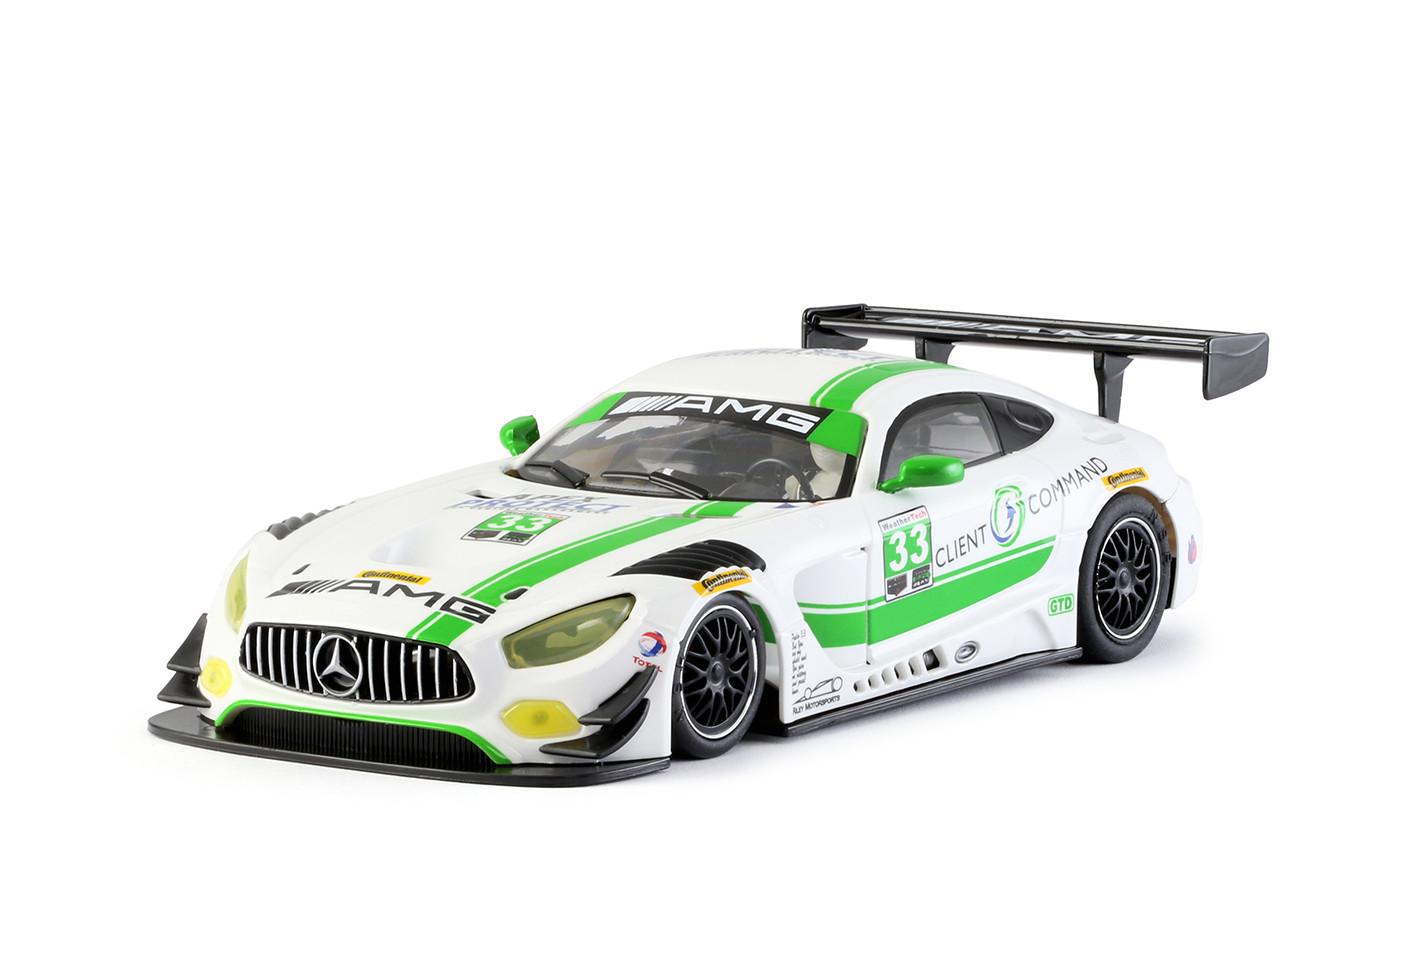 NSR - Mercedes AMG #33, Sebring 2017: 0114AW